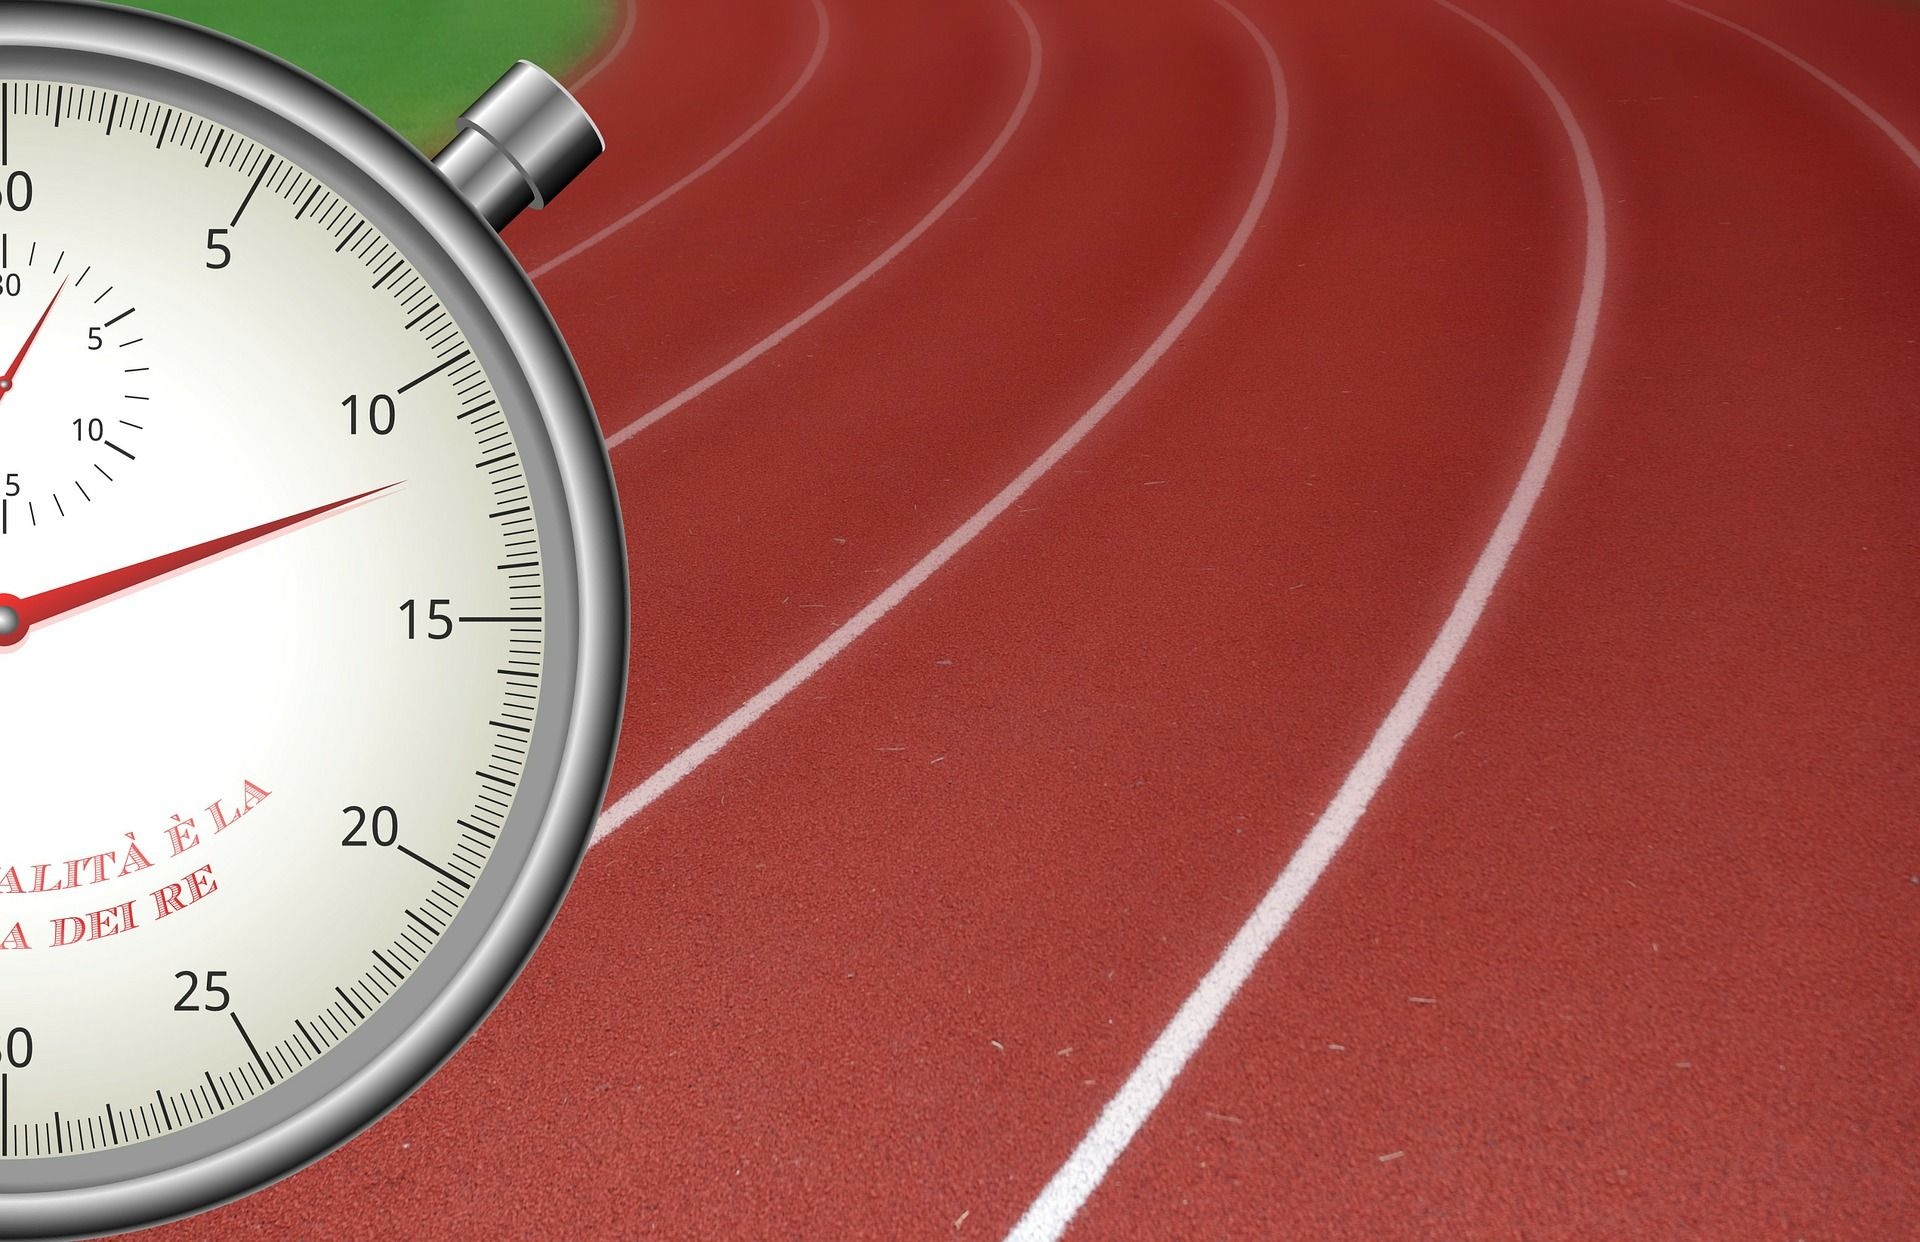 ATLETSKO SP Portugalka Henriques svjetskim rekordom do prvog naslova svjetske prvakinje na 50 km brzo hodanje